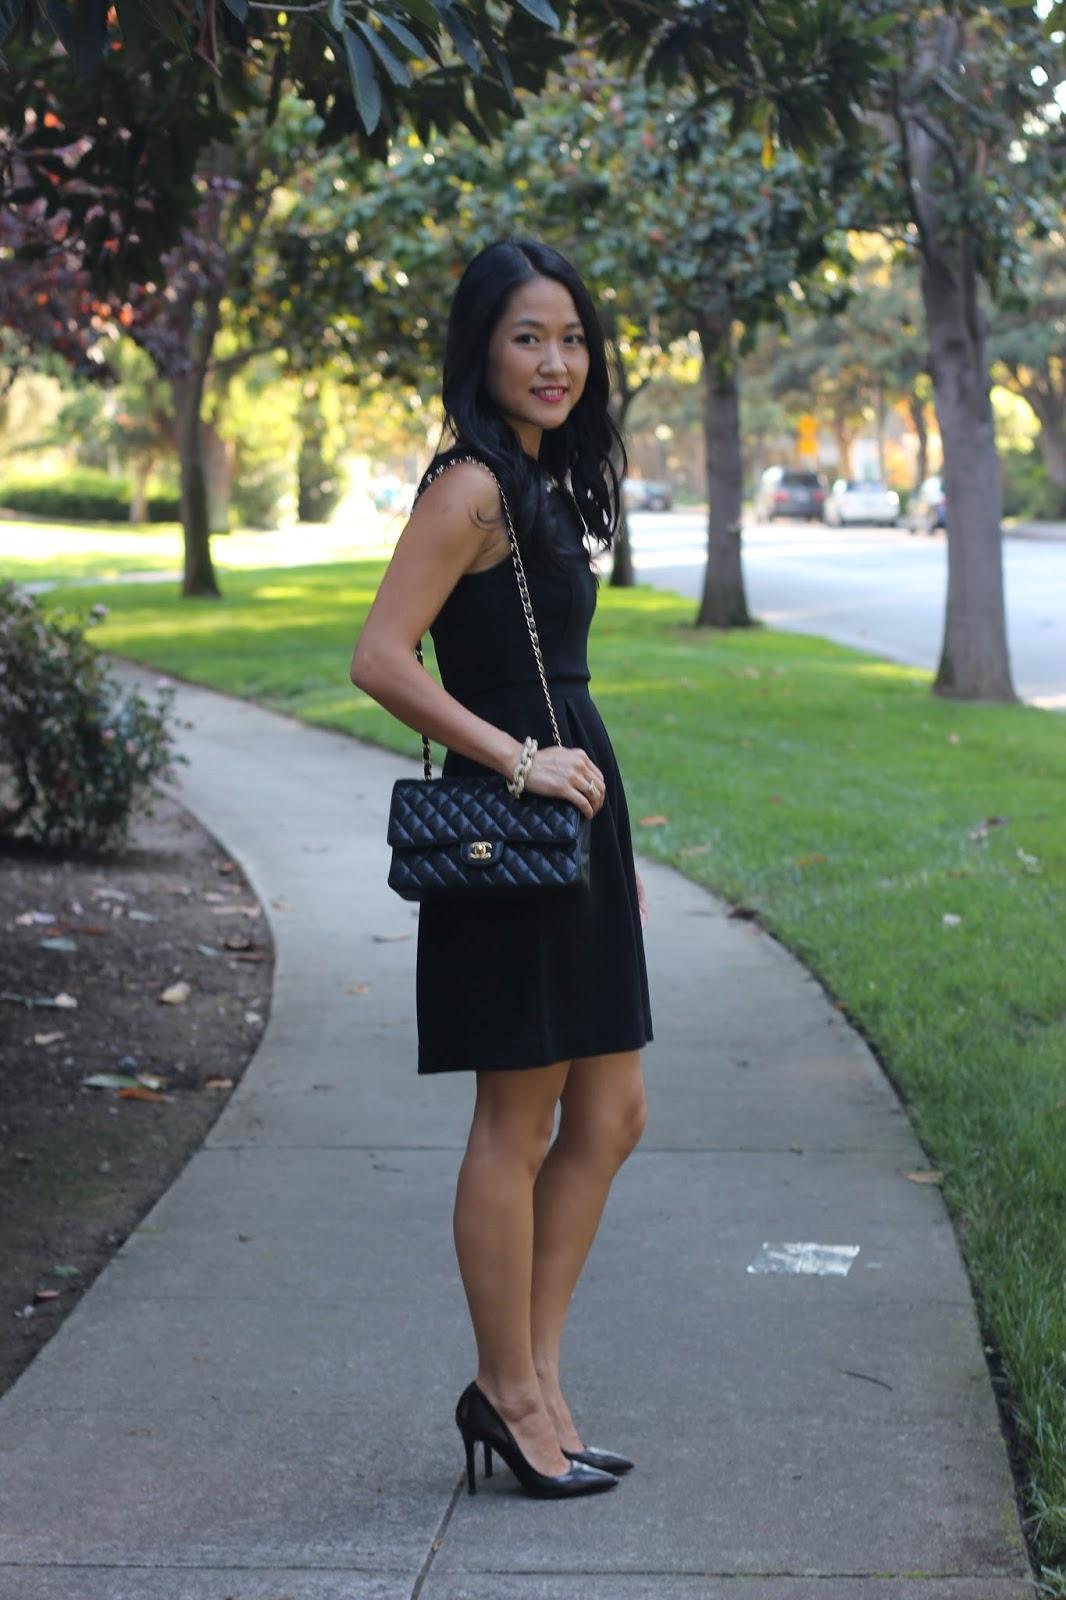 Upscale Casual Dress Code